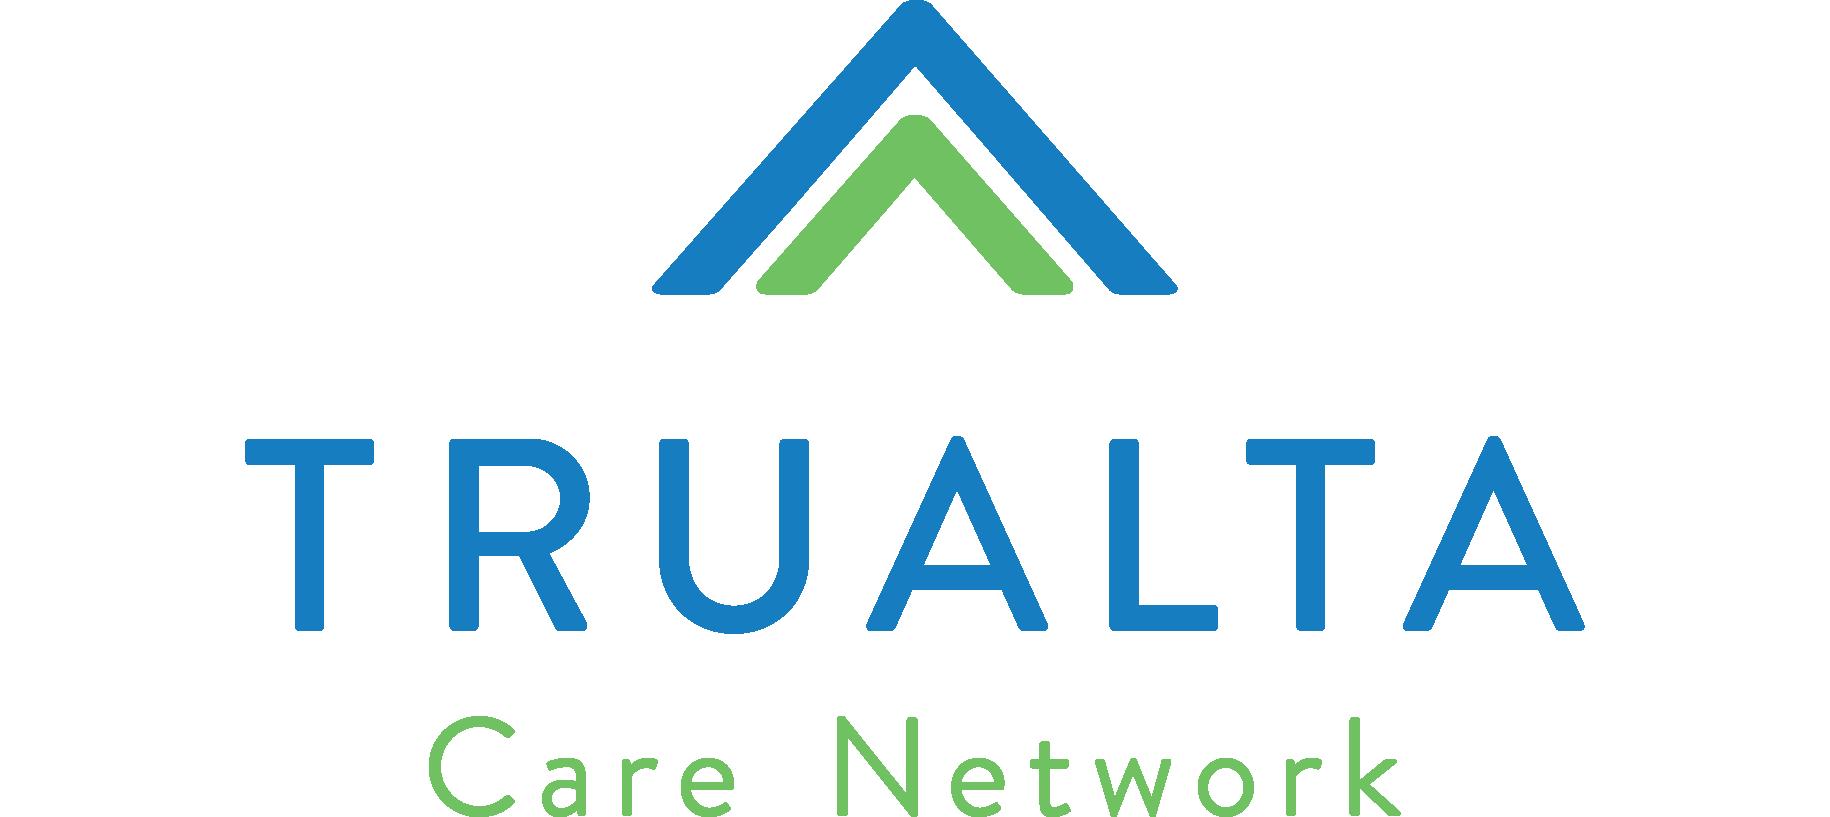 trualta_logo.png